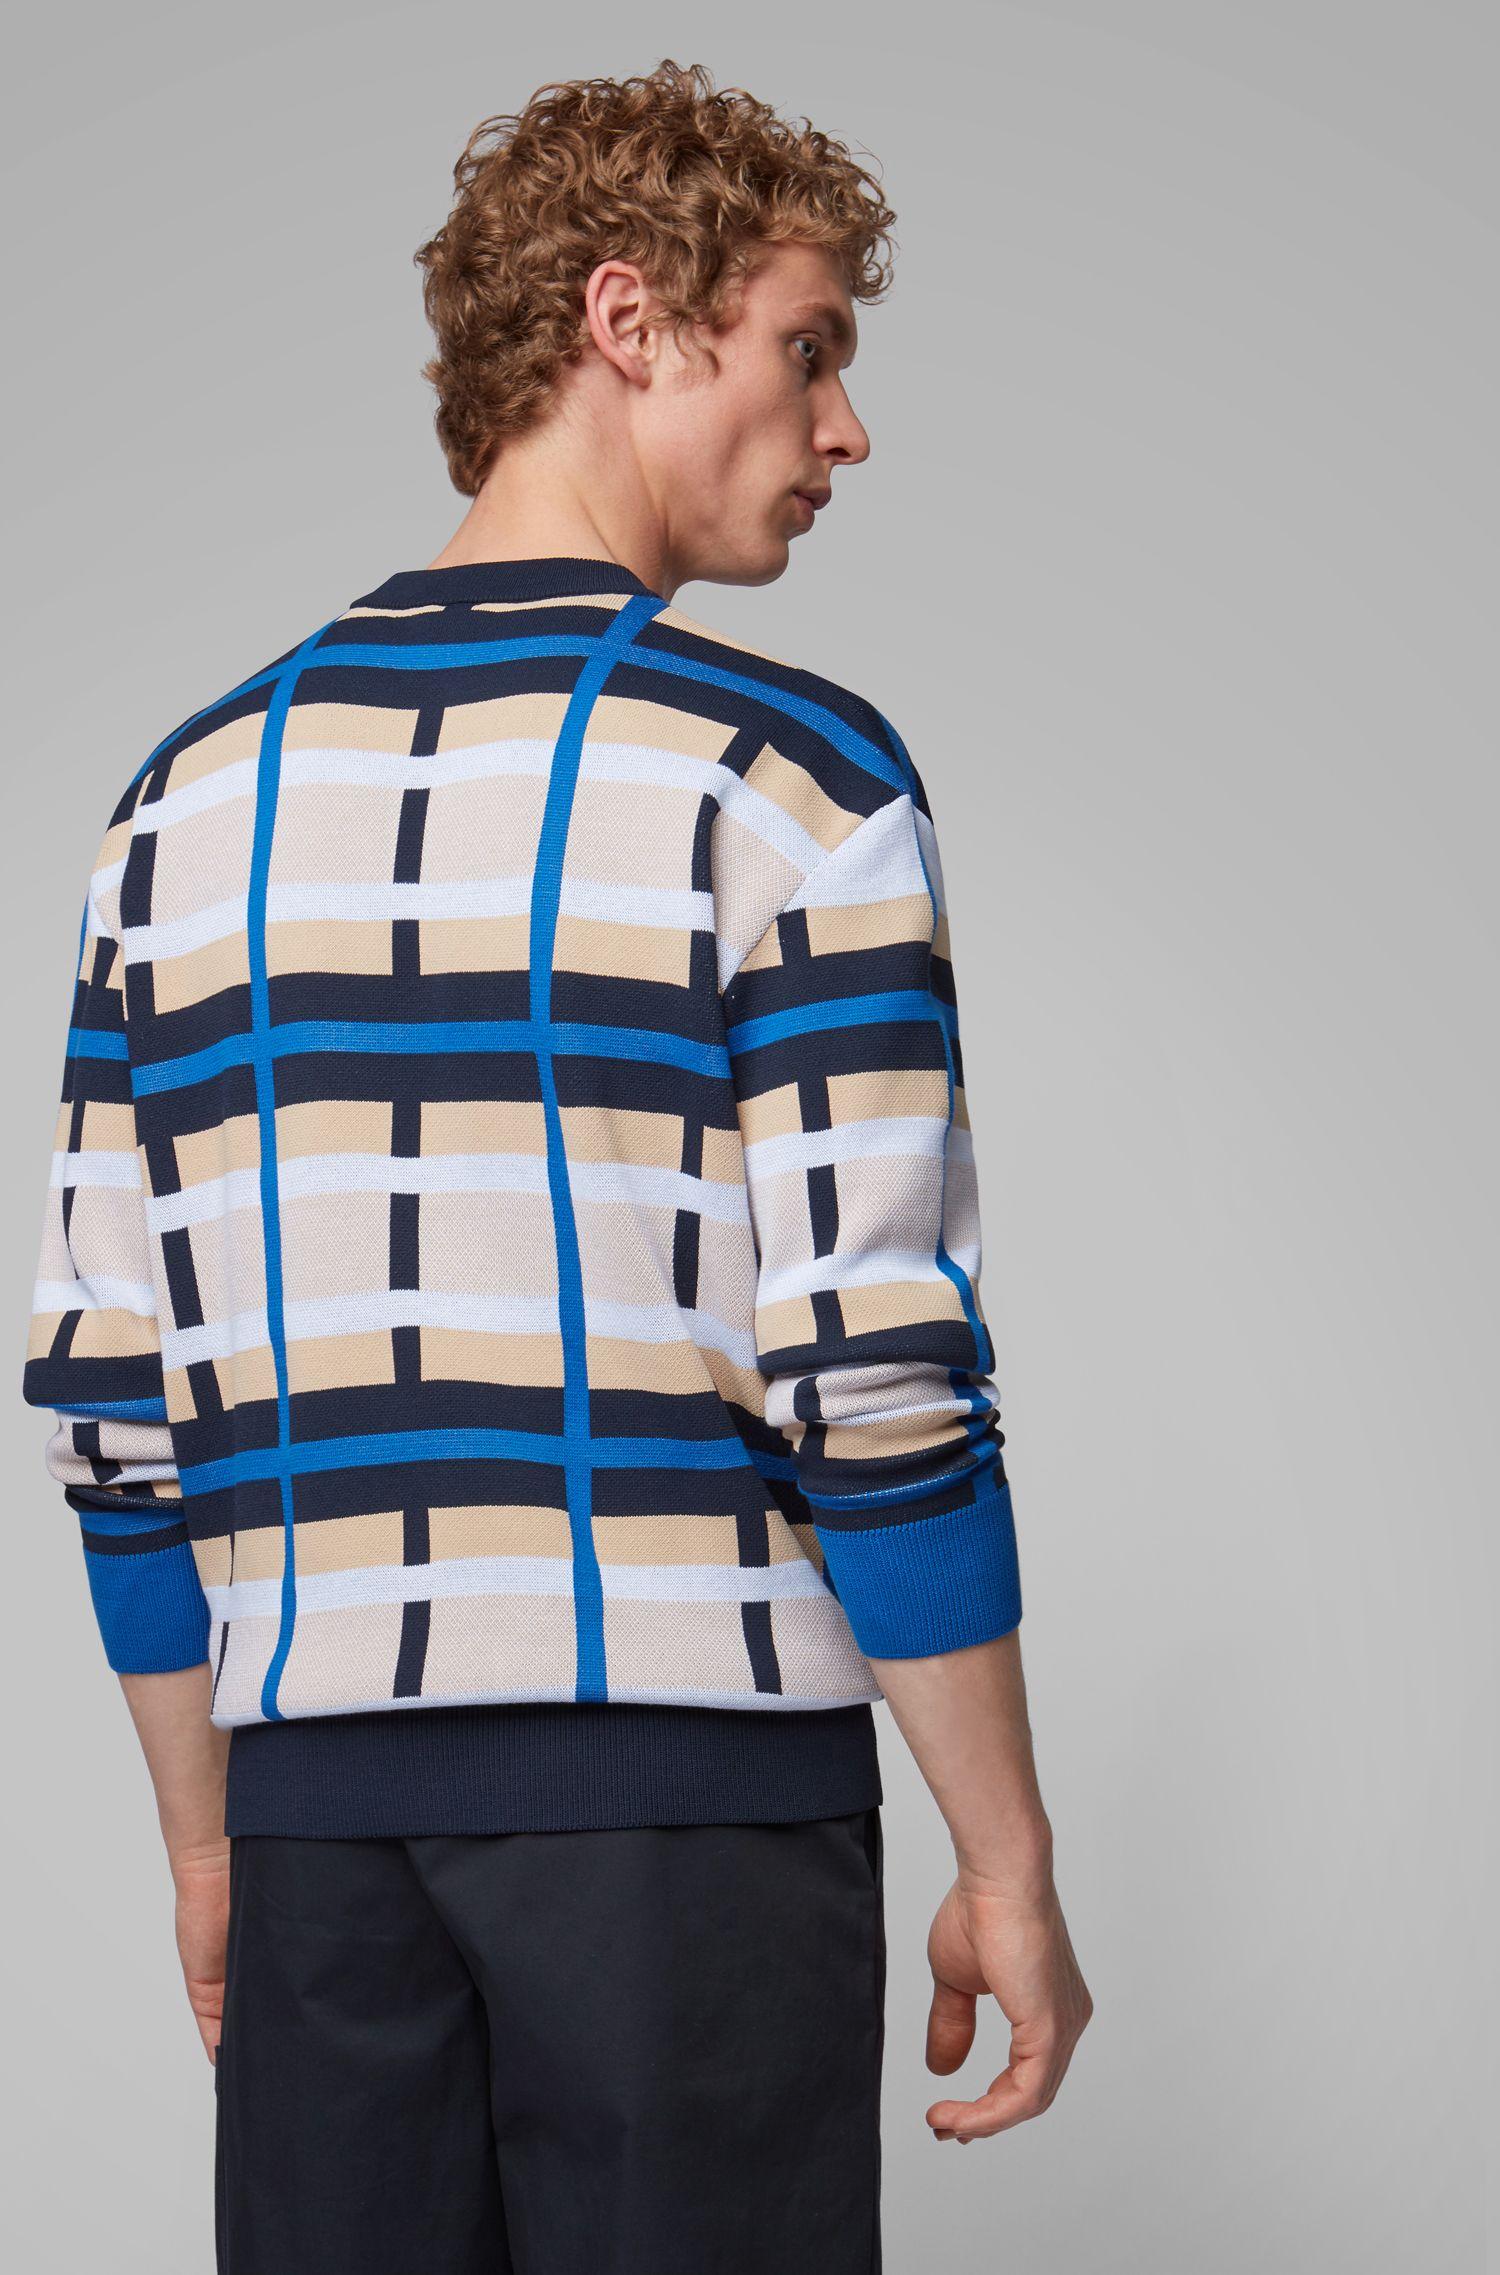 Strickpullover mit mehrfarbigem Muster, Blau